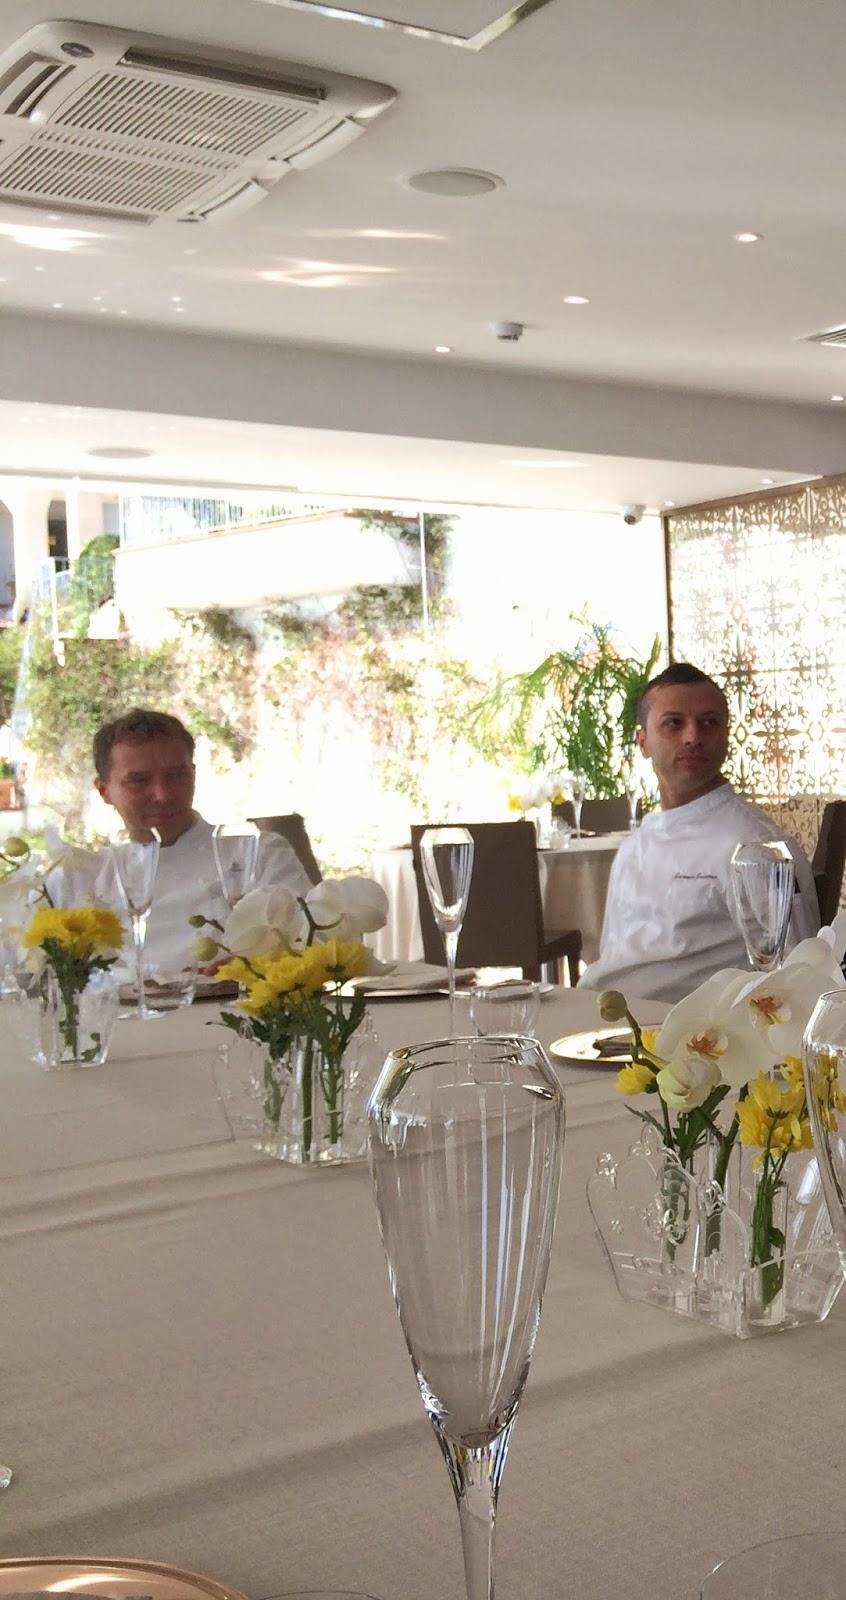 Ristorante_Re_Maurì_Lloyd's_Baia_Hotel_Vietri_su_ Mare_Salerno_Costiera_Amalfitana_Chef_Oliver_Glowig_Chef_Lorenzo_Cuomo